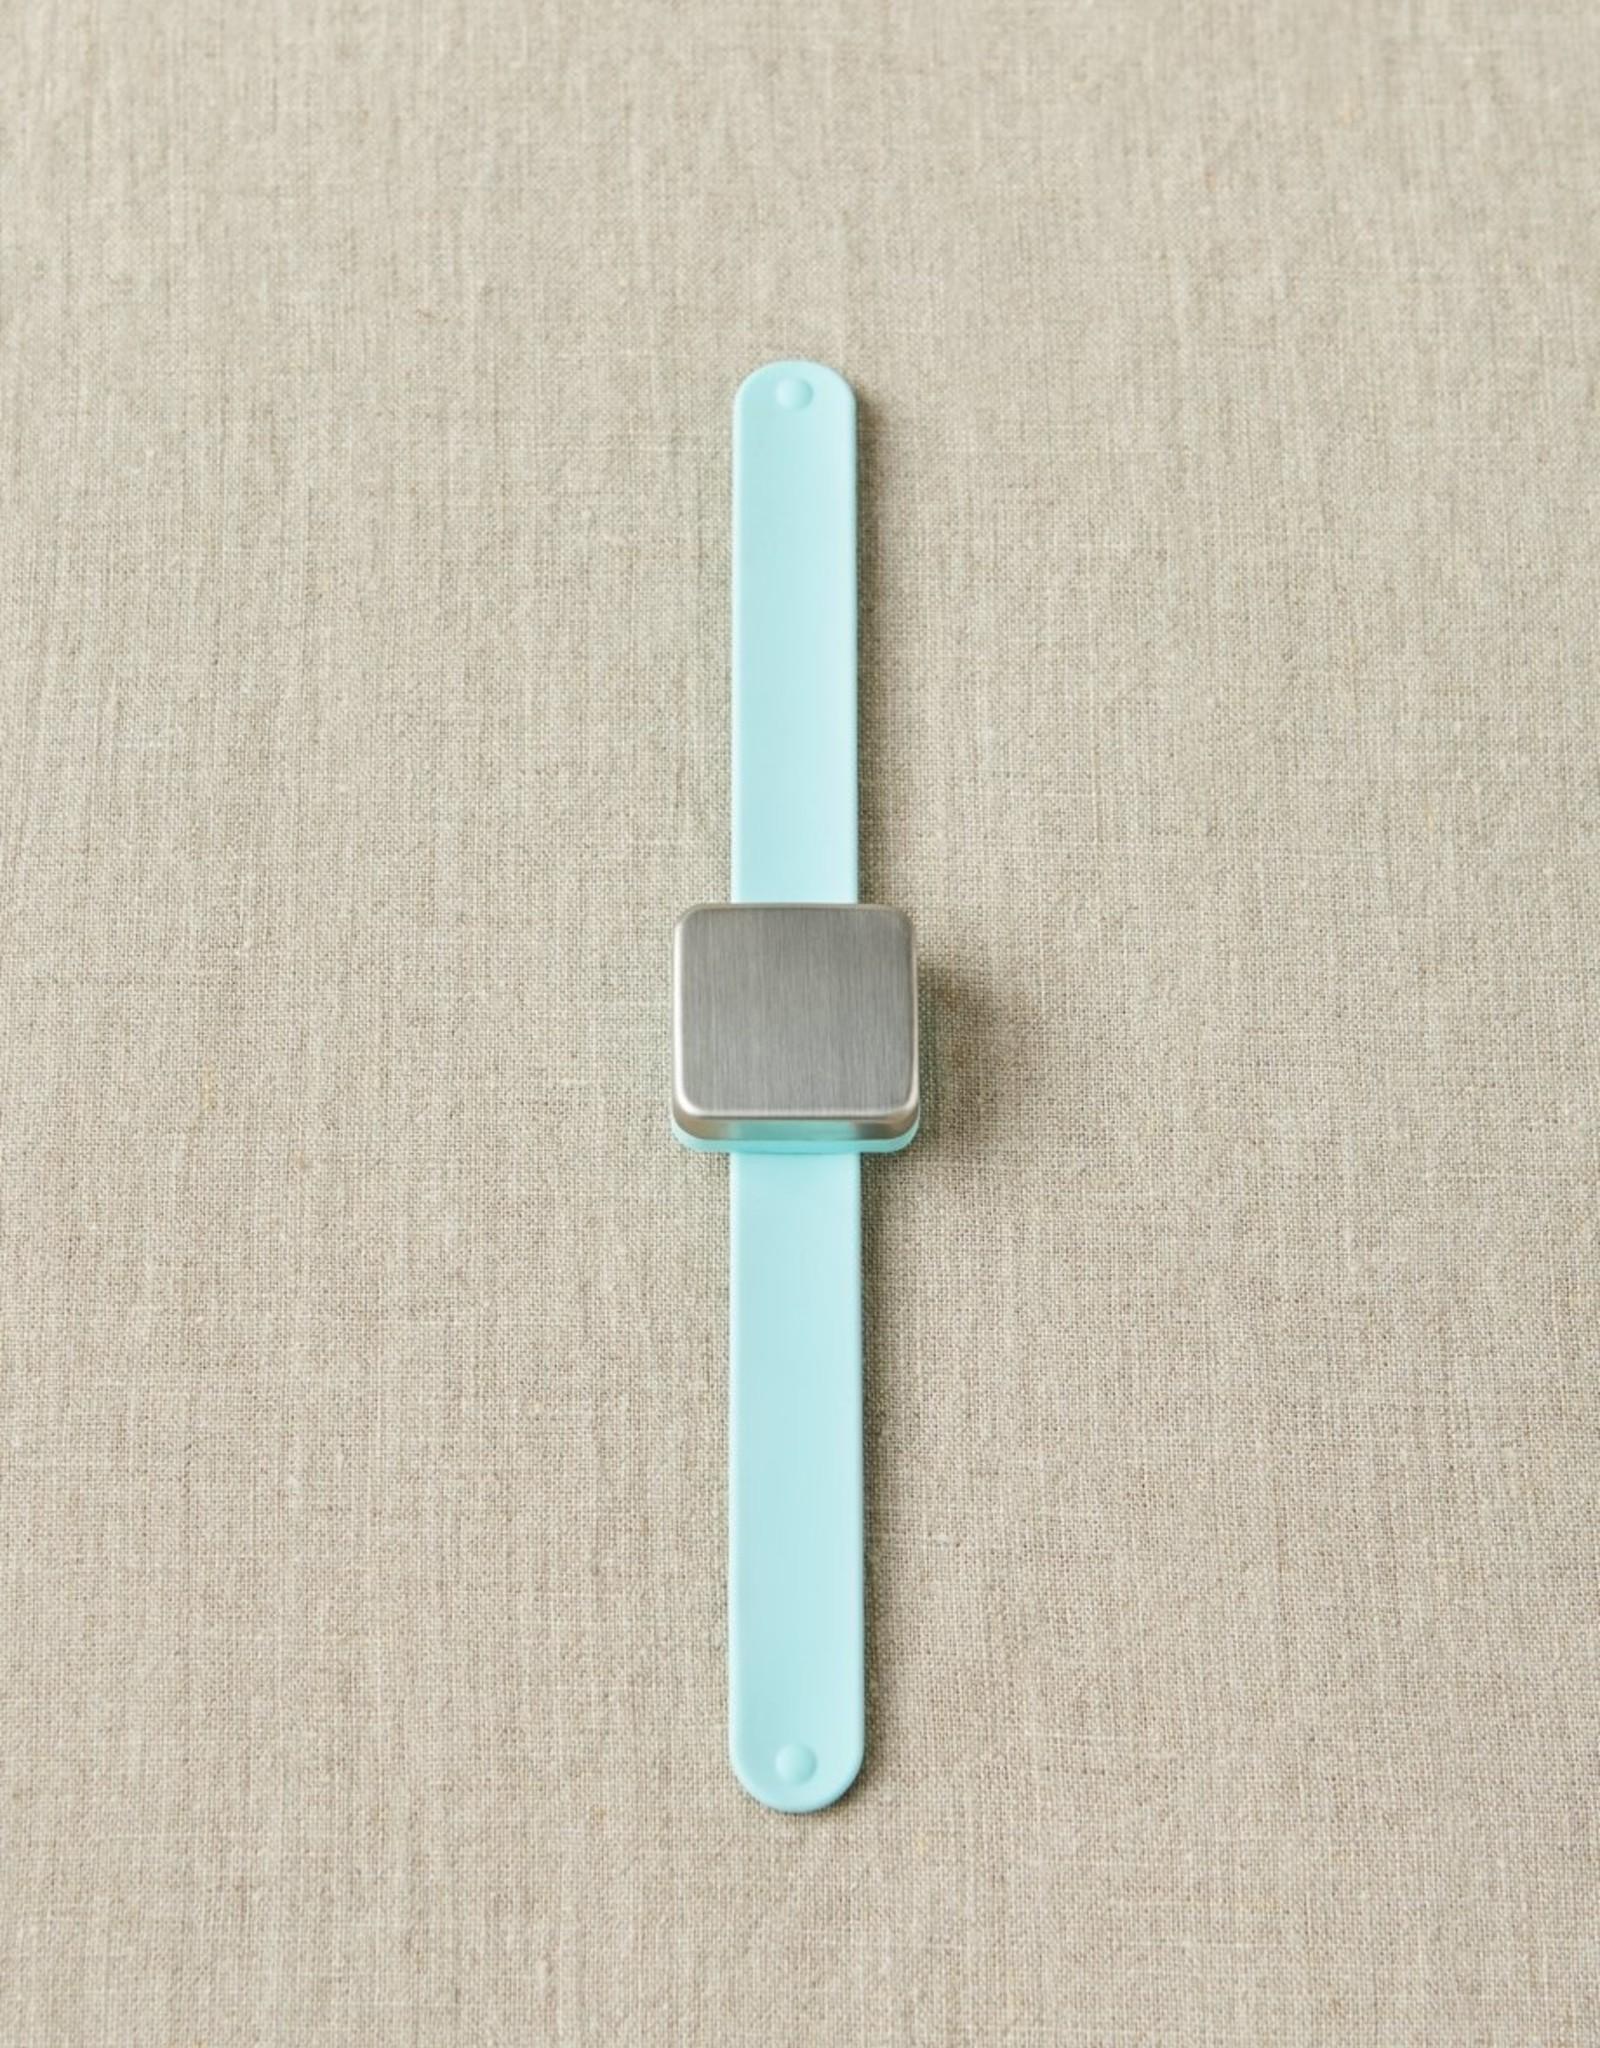 Cocoknits Cocoknits Maker's Keep Snap Bracelet